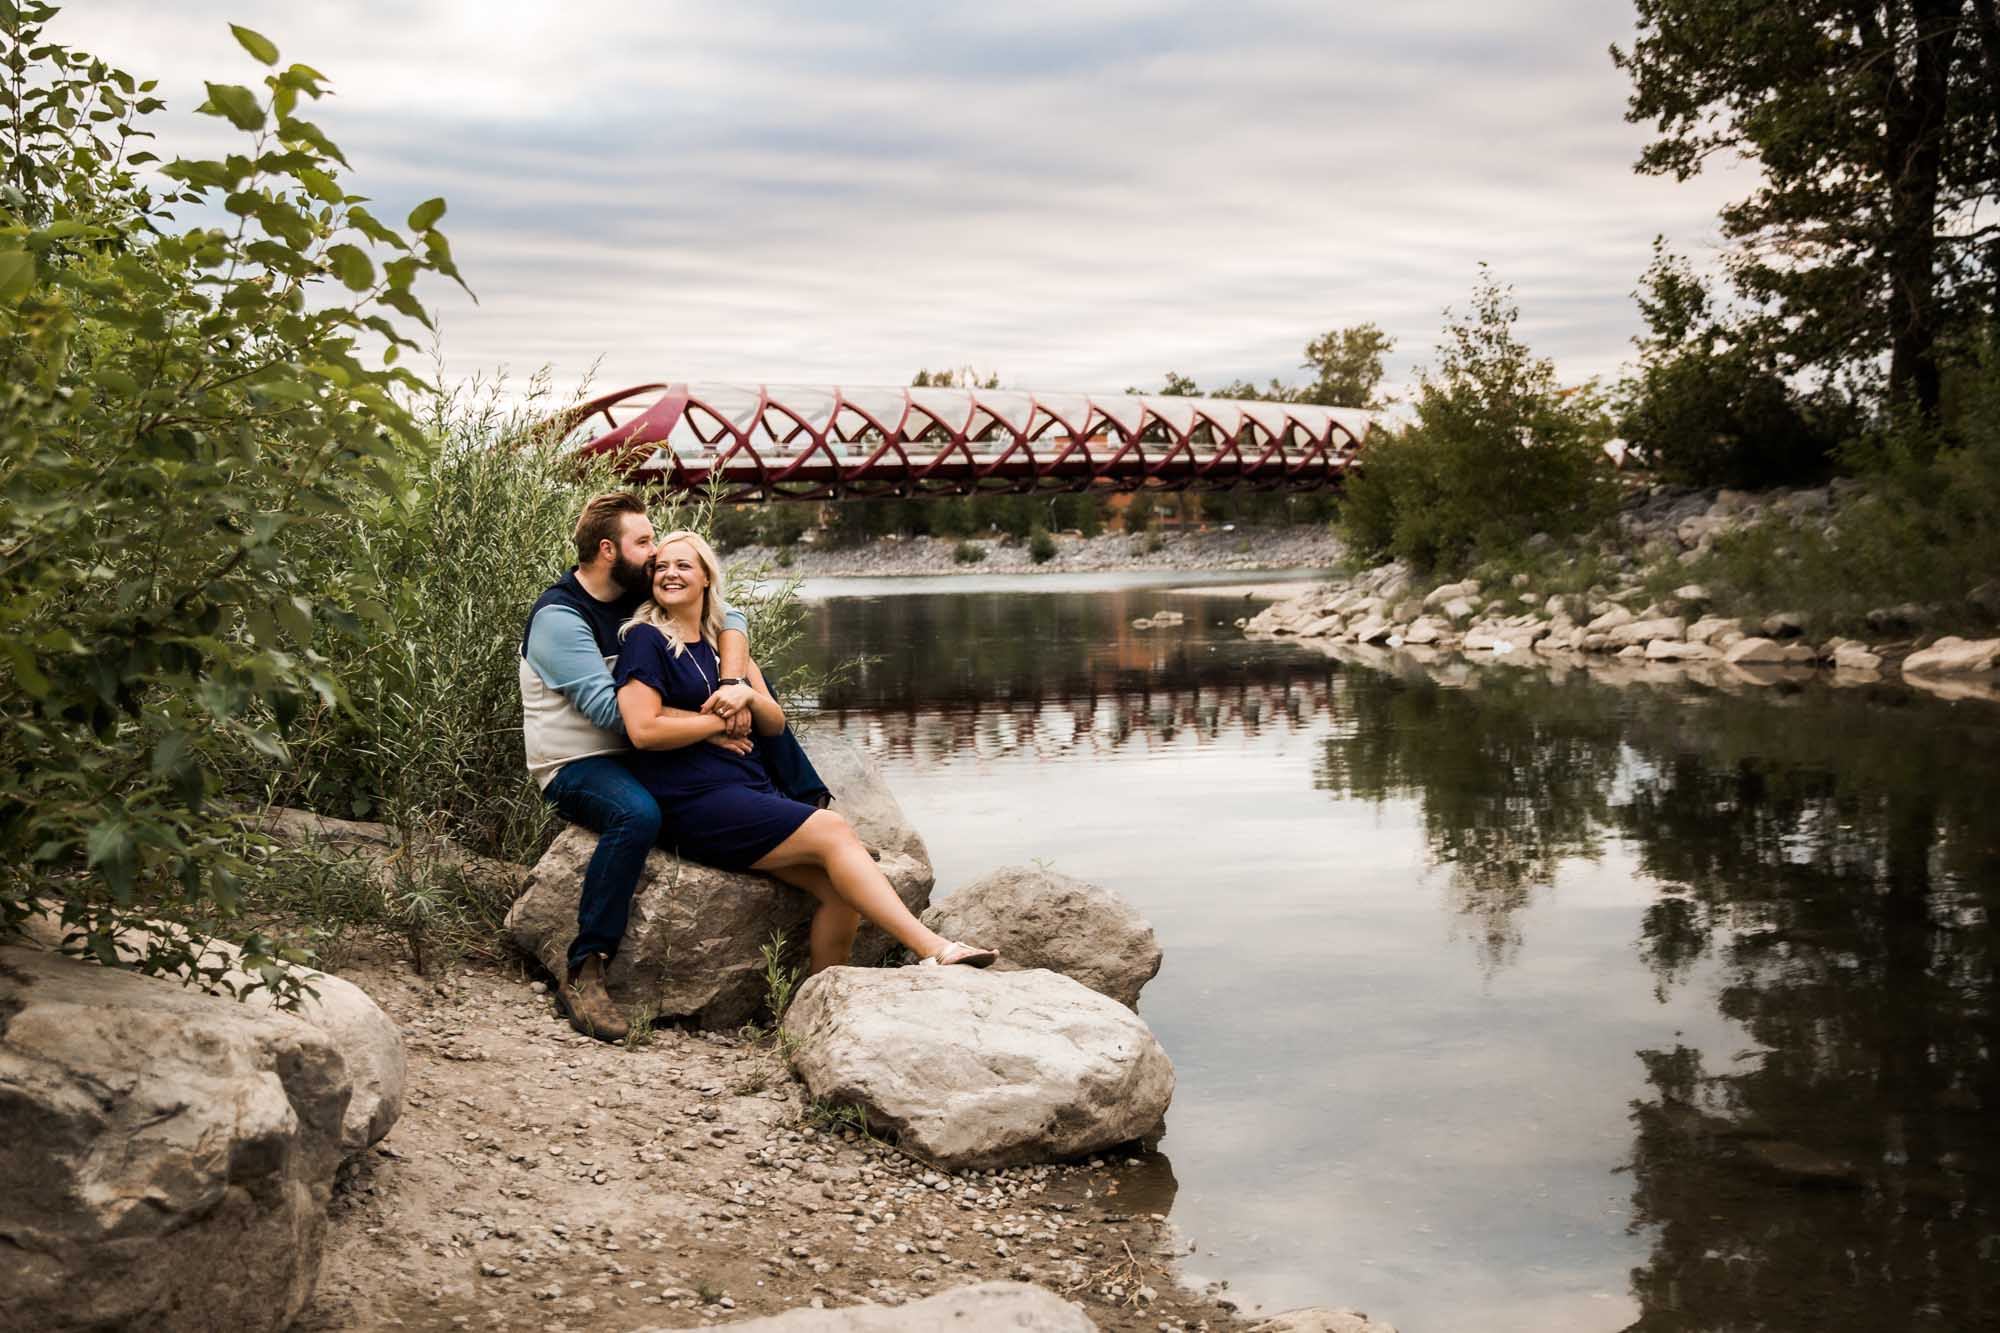 Calgary wedding photographer, engagement photos at Prince's Island Park, downtown Calgary, couple at sunset